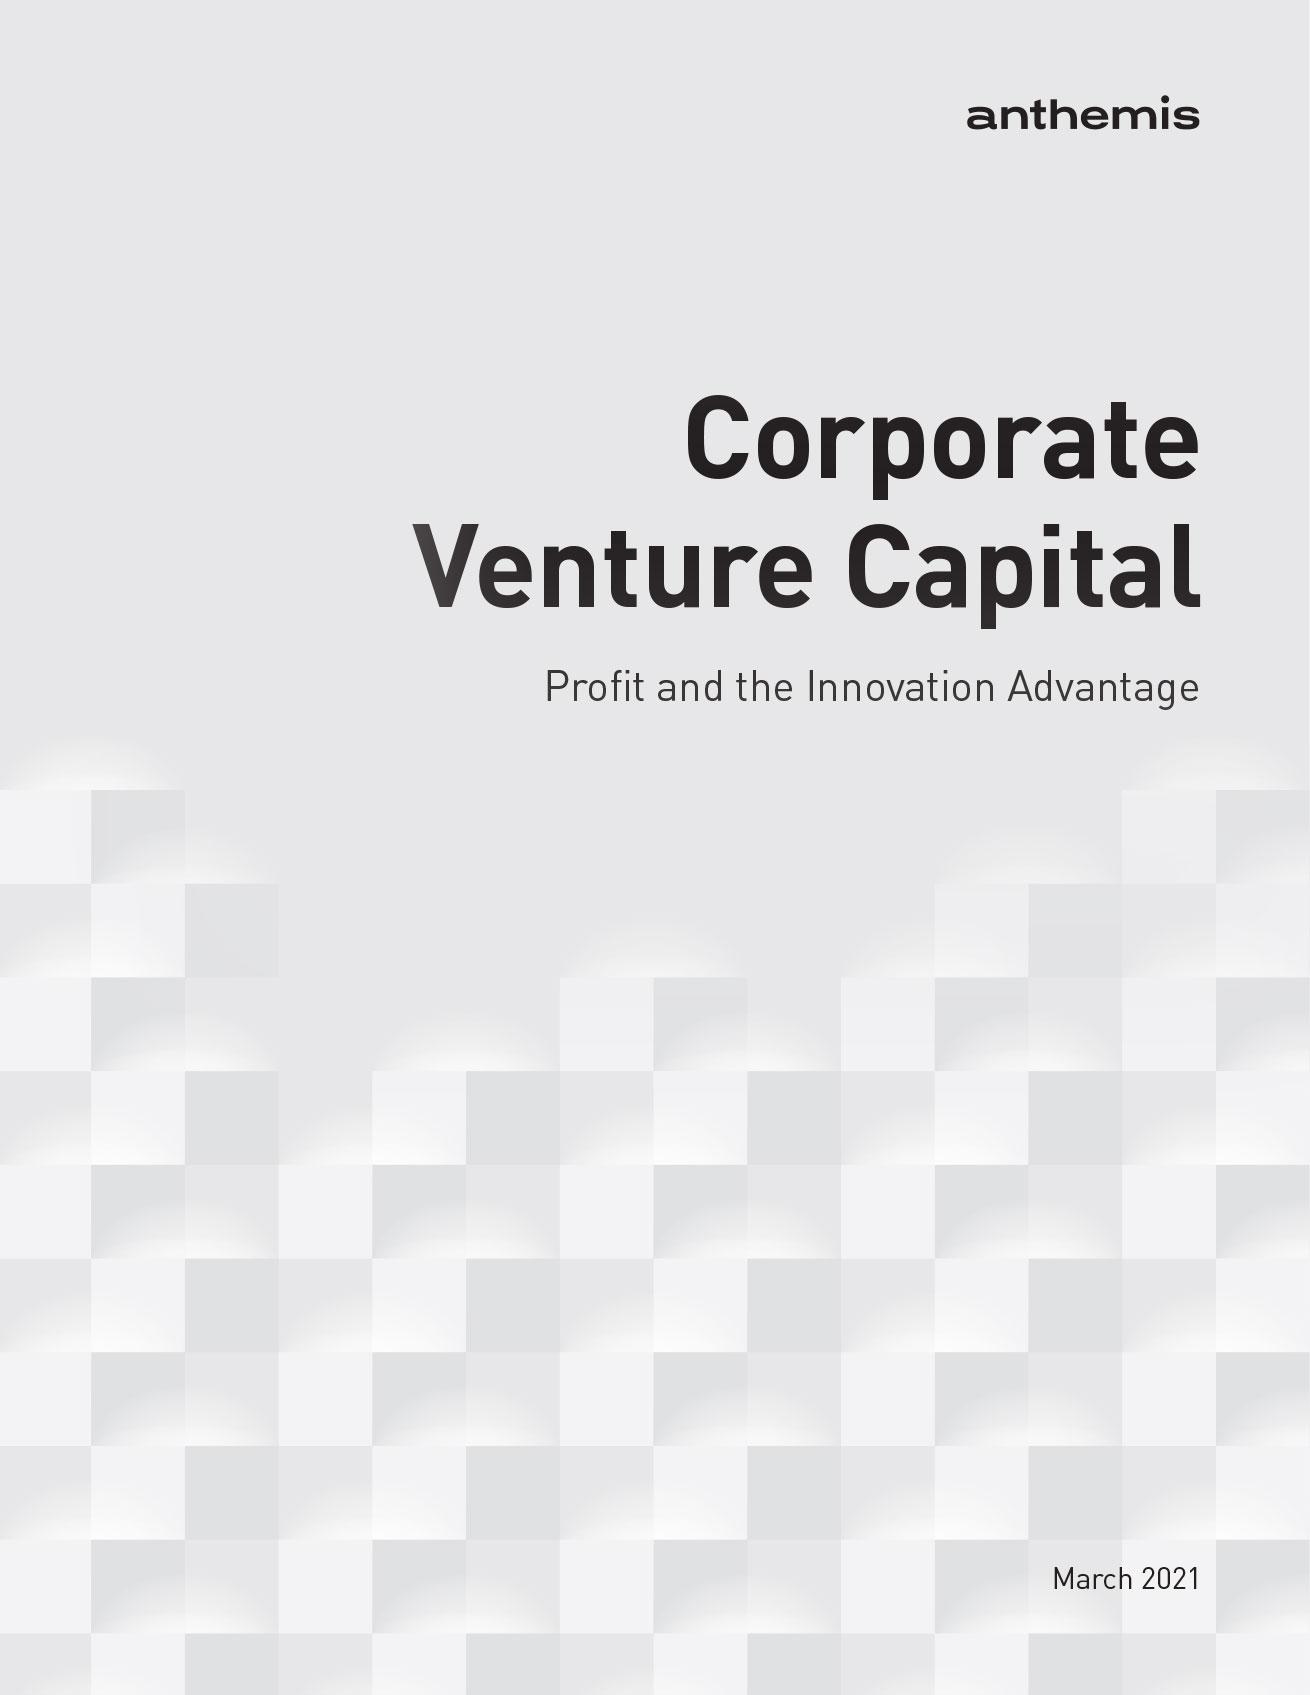 Anthemis-Corporate-Venture-Capital-White-Paper-March-2021